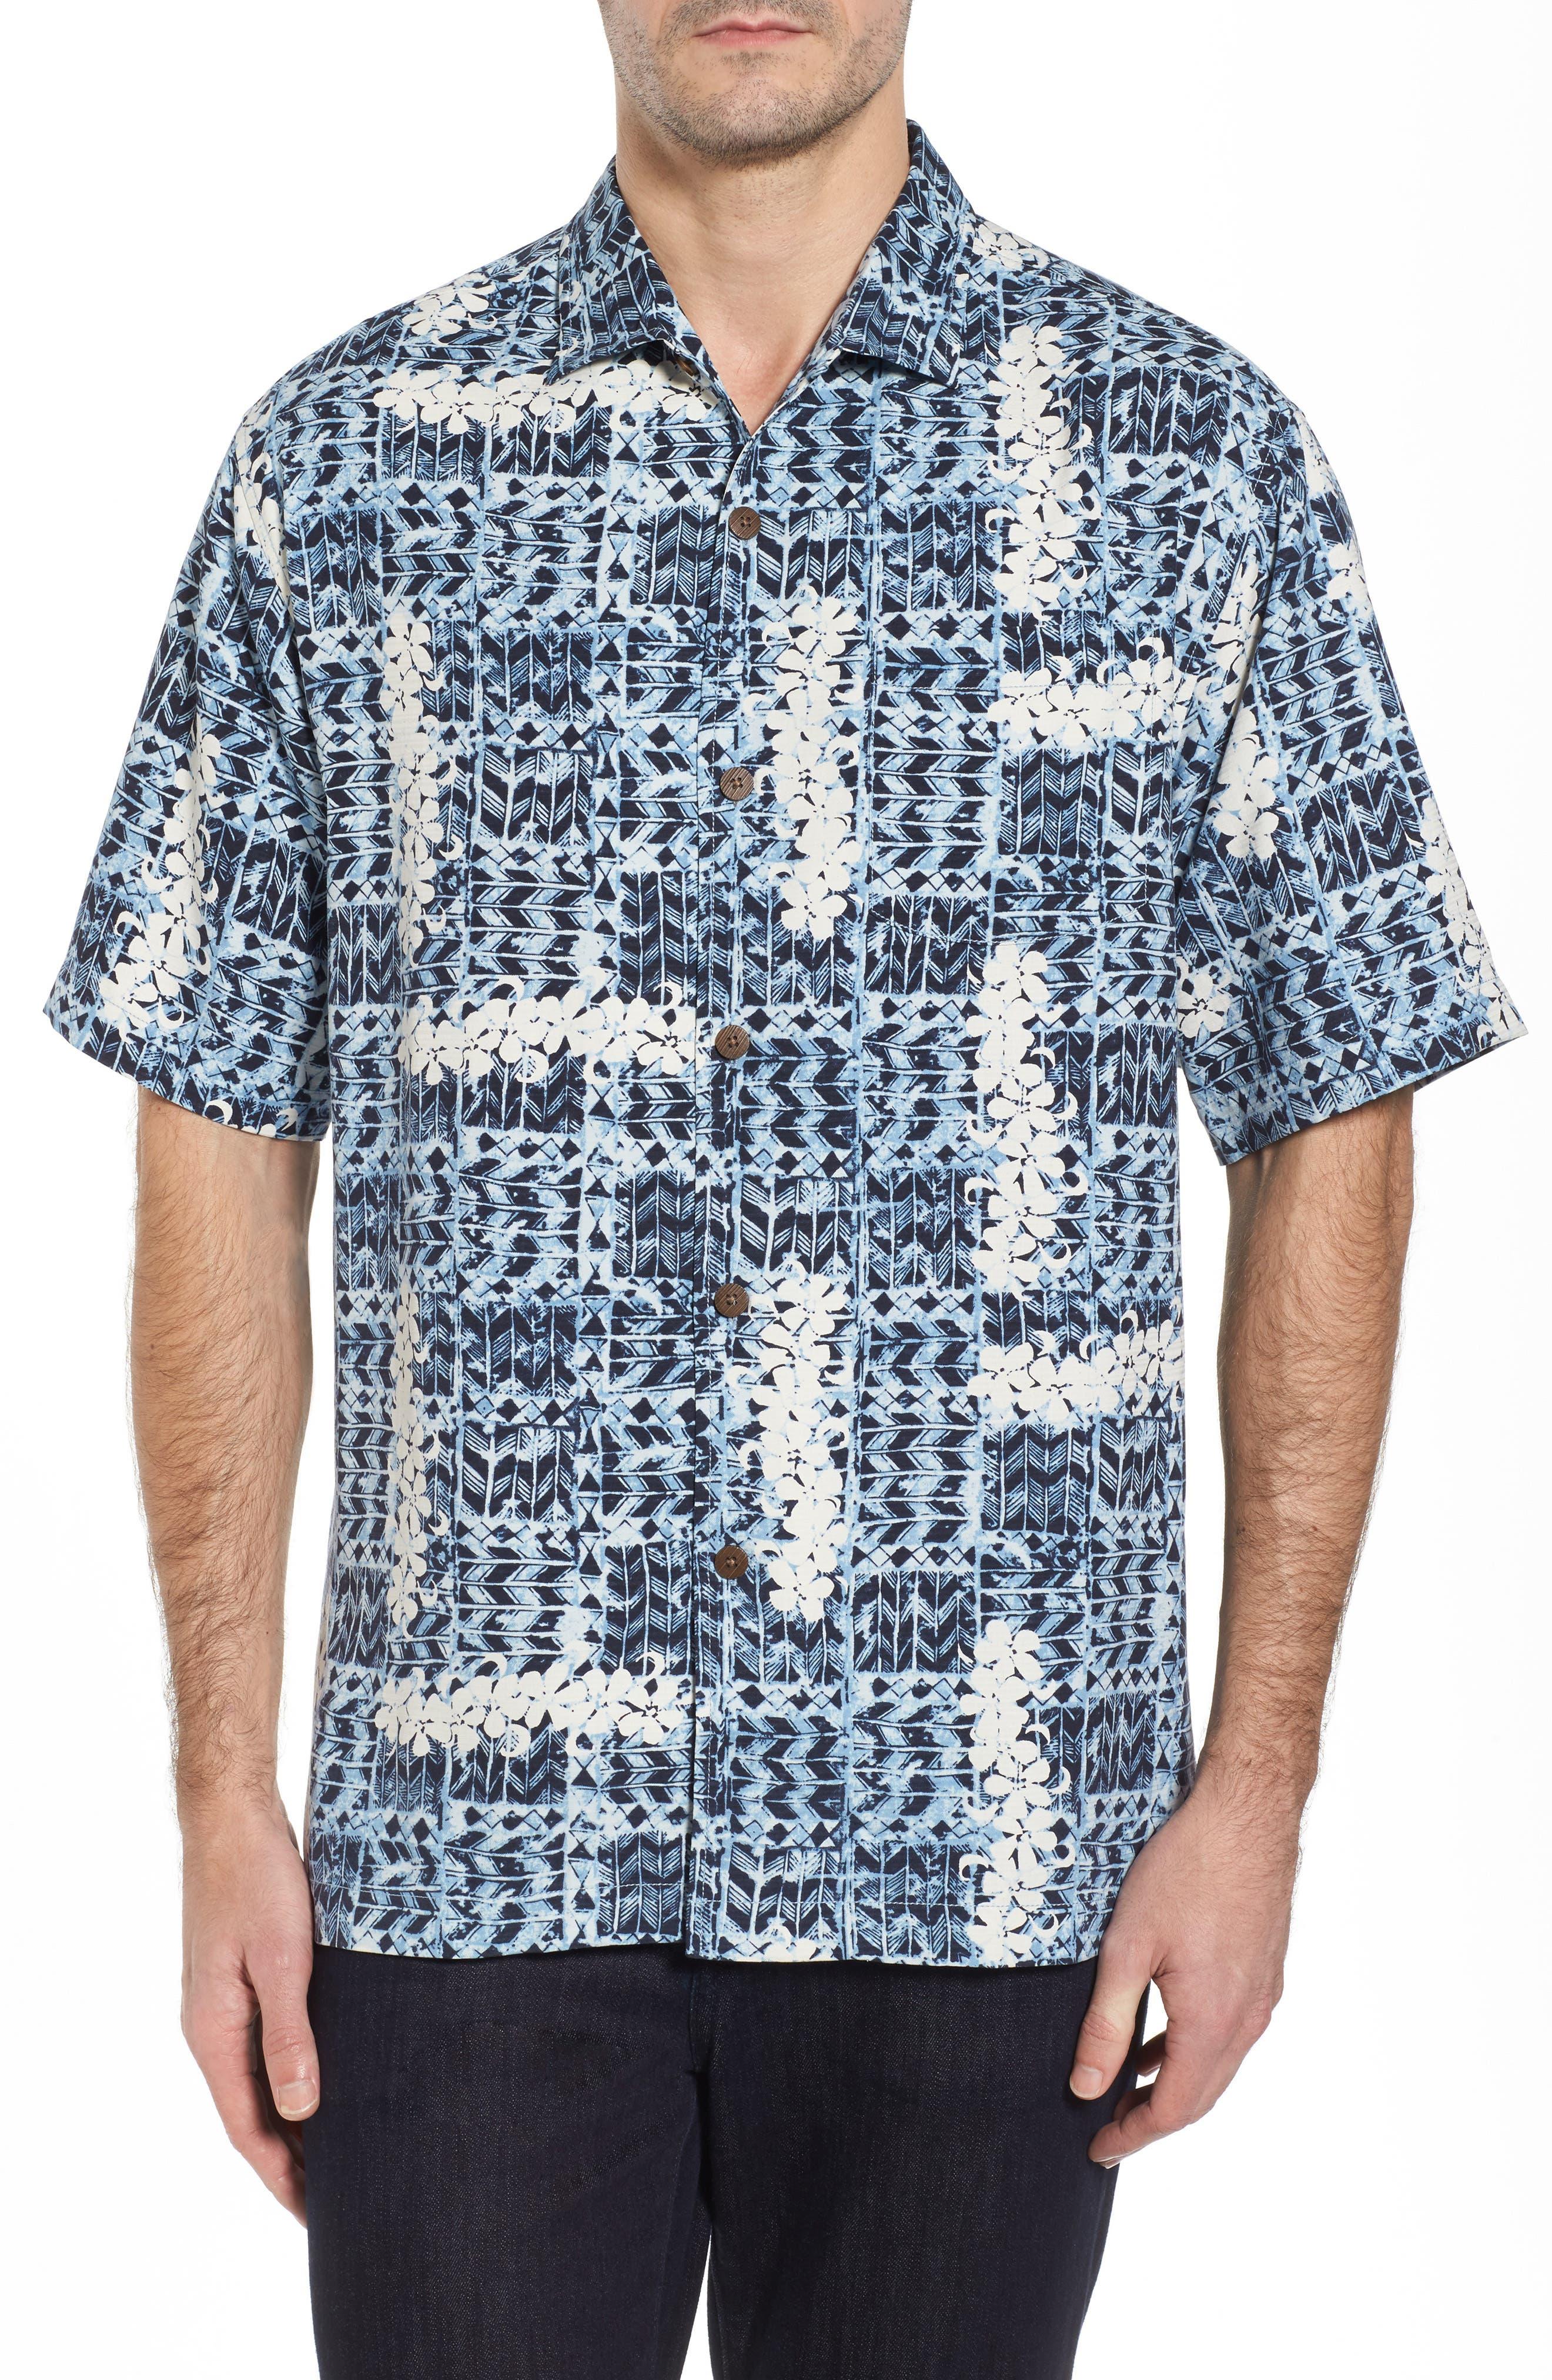 Alternate Image 1 Selected - Tommy Bahama Olei Olei Silk Camp Shirt